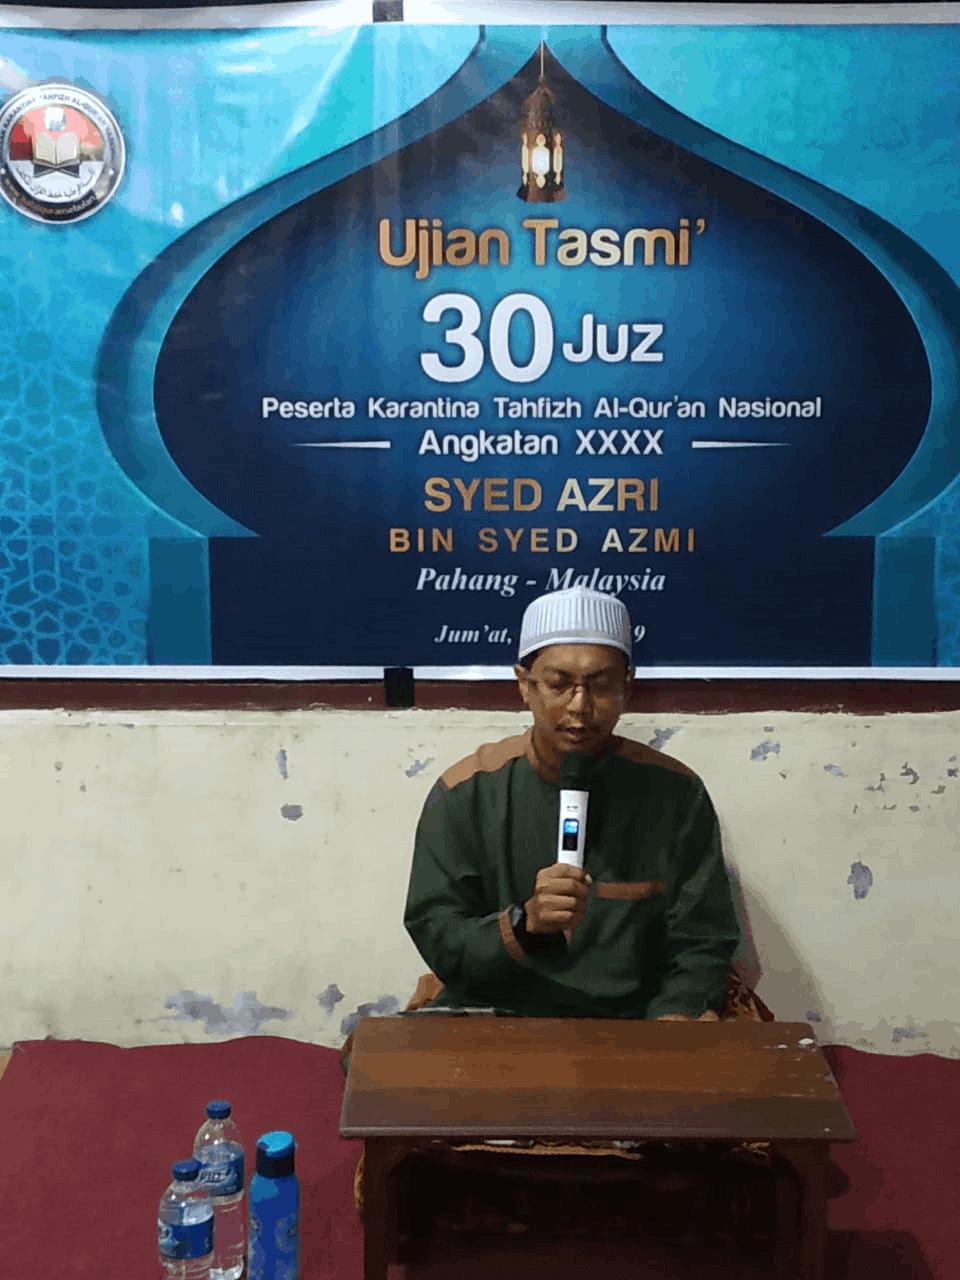 Menghafal Quran di pusat karantina tahhfizh al-quran nasional